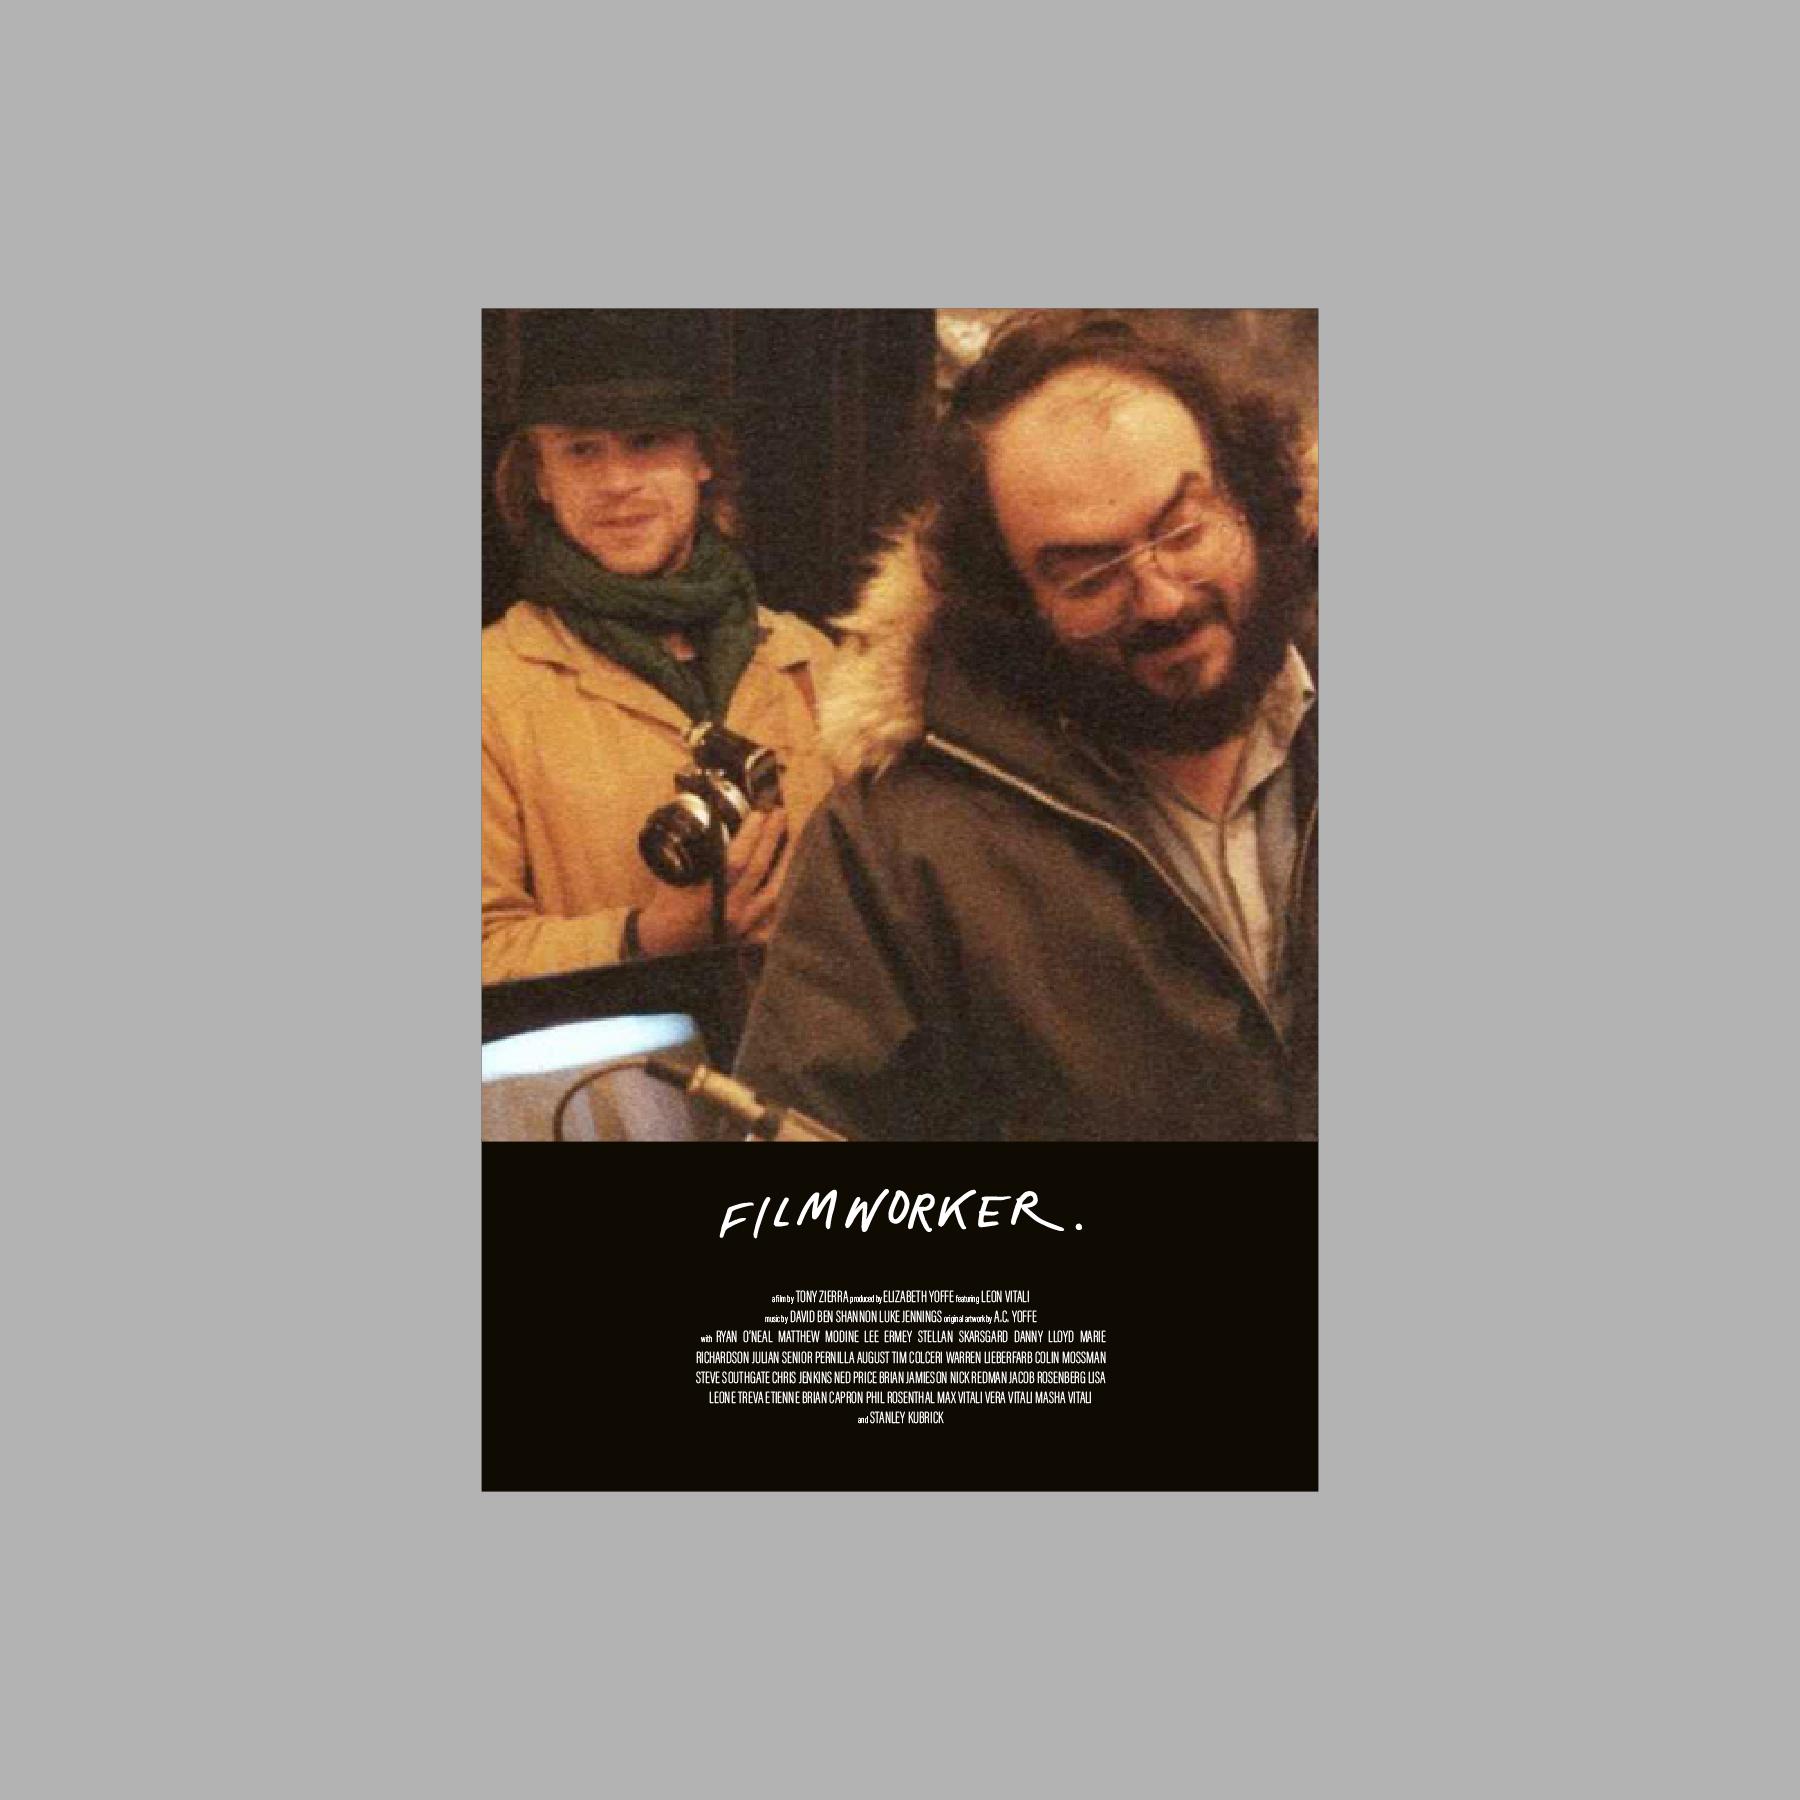 28-08-18_SFF-2018_Filmworker.png